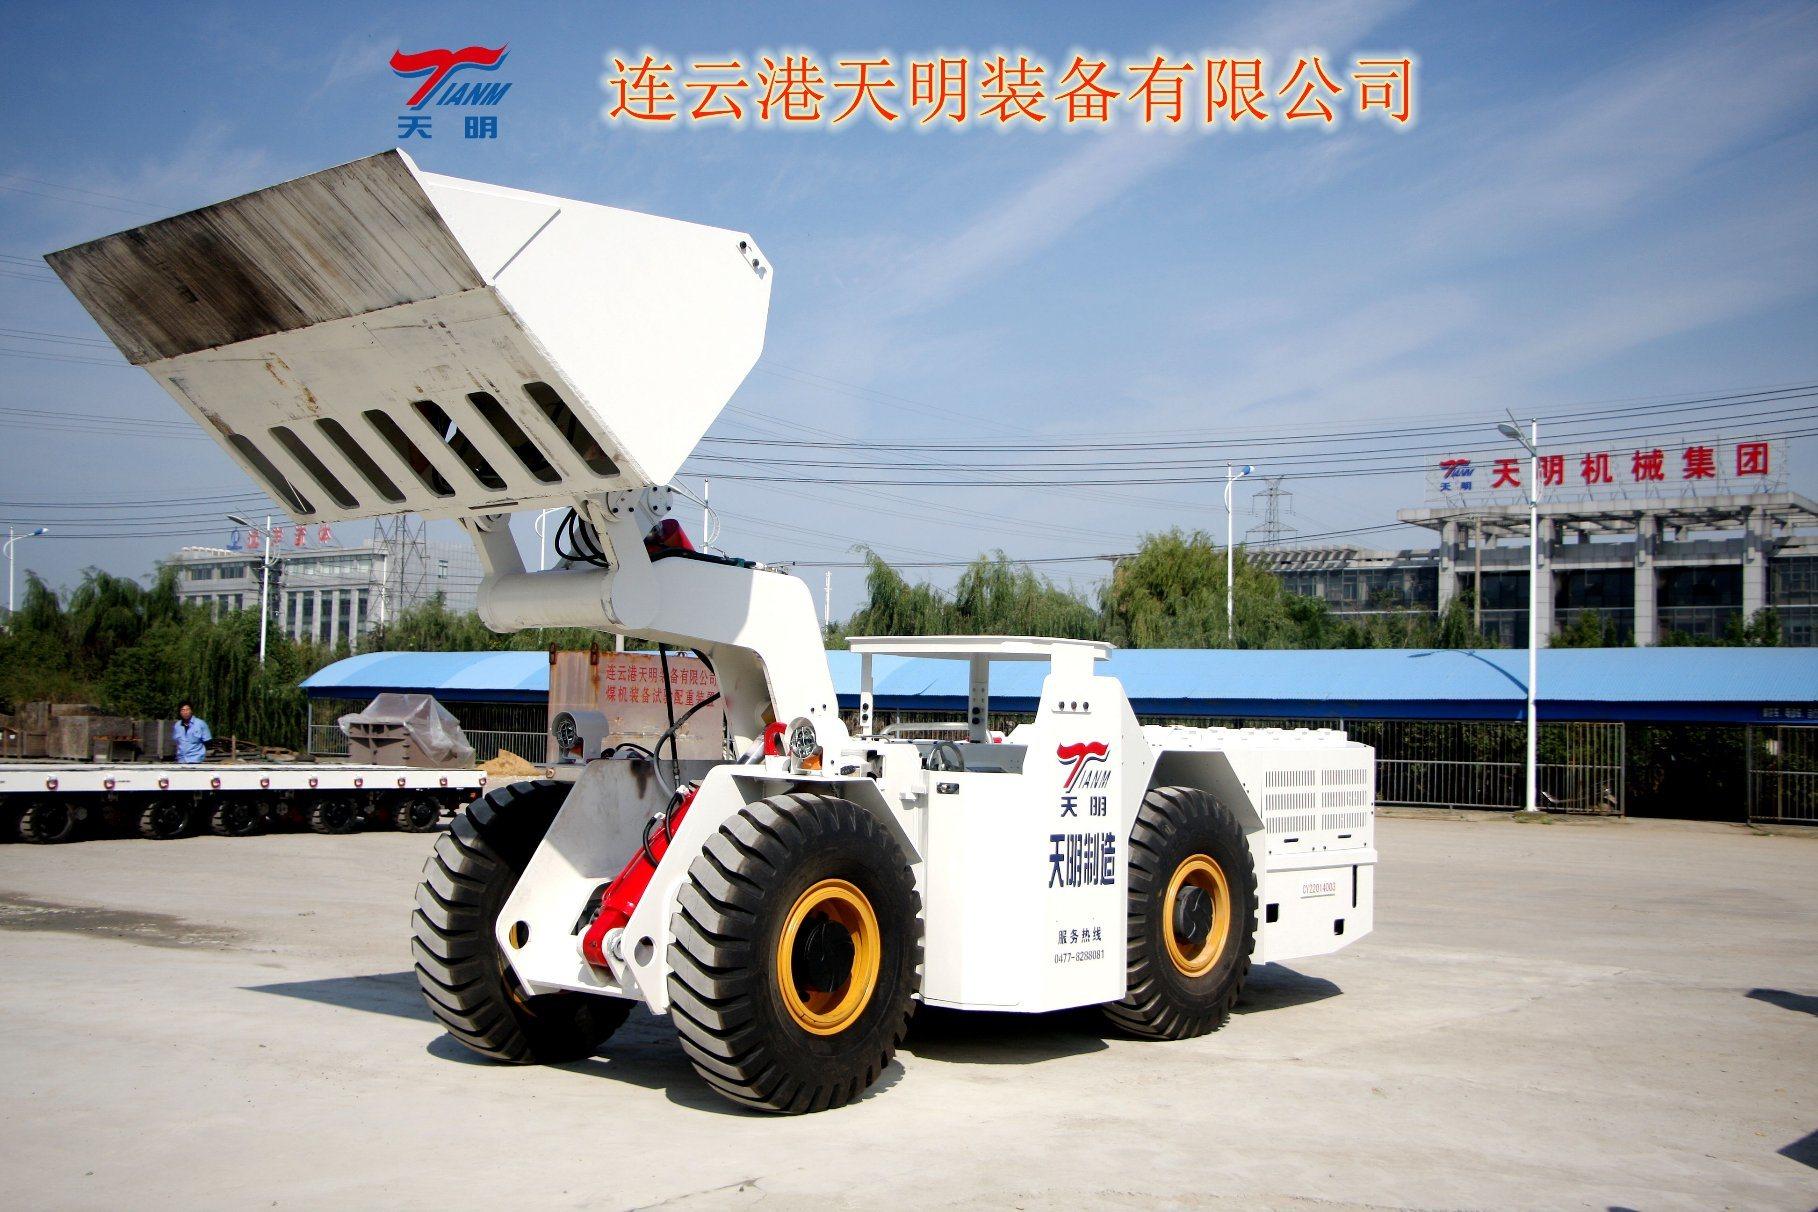 15t Mining Explosion-Proof Diesel LHD